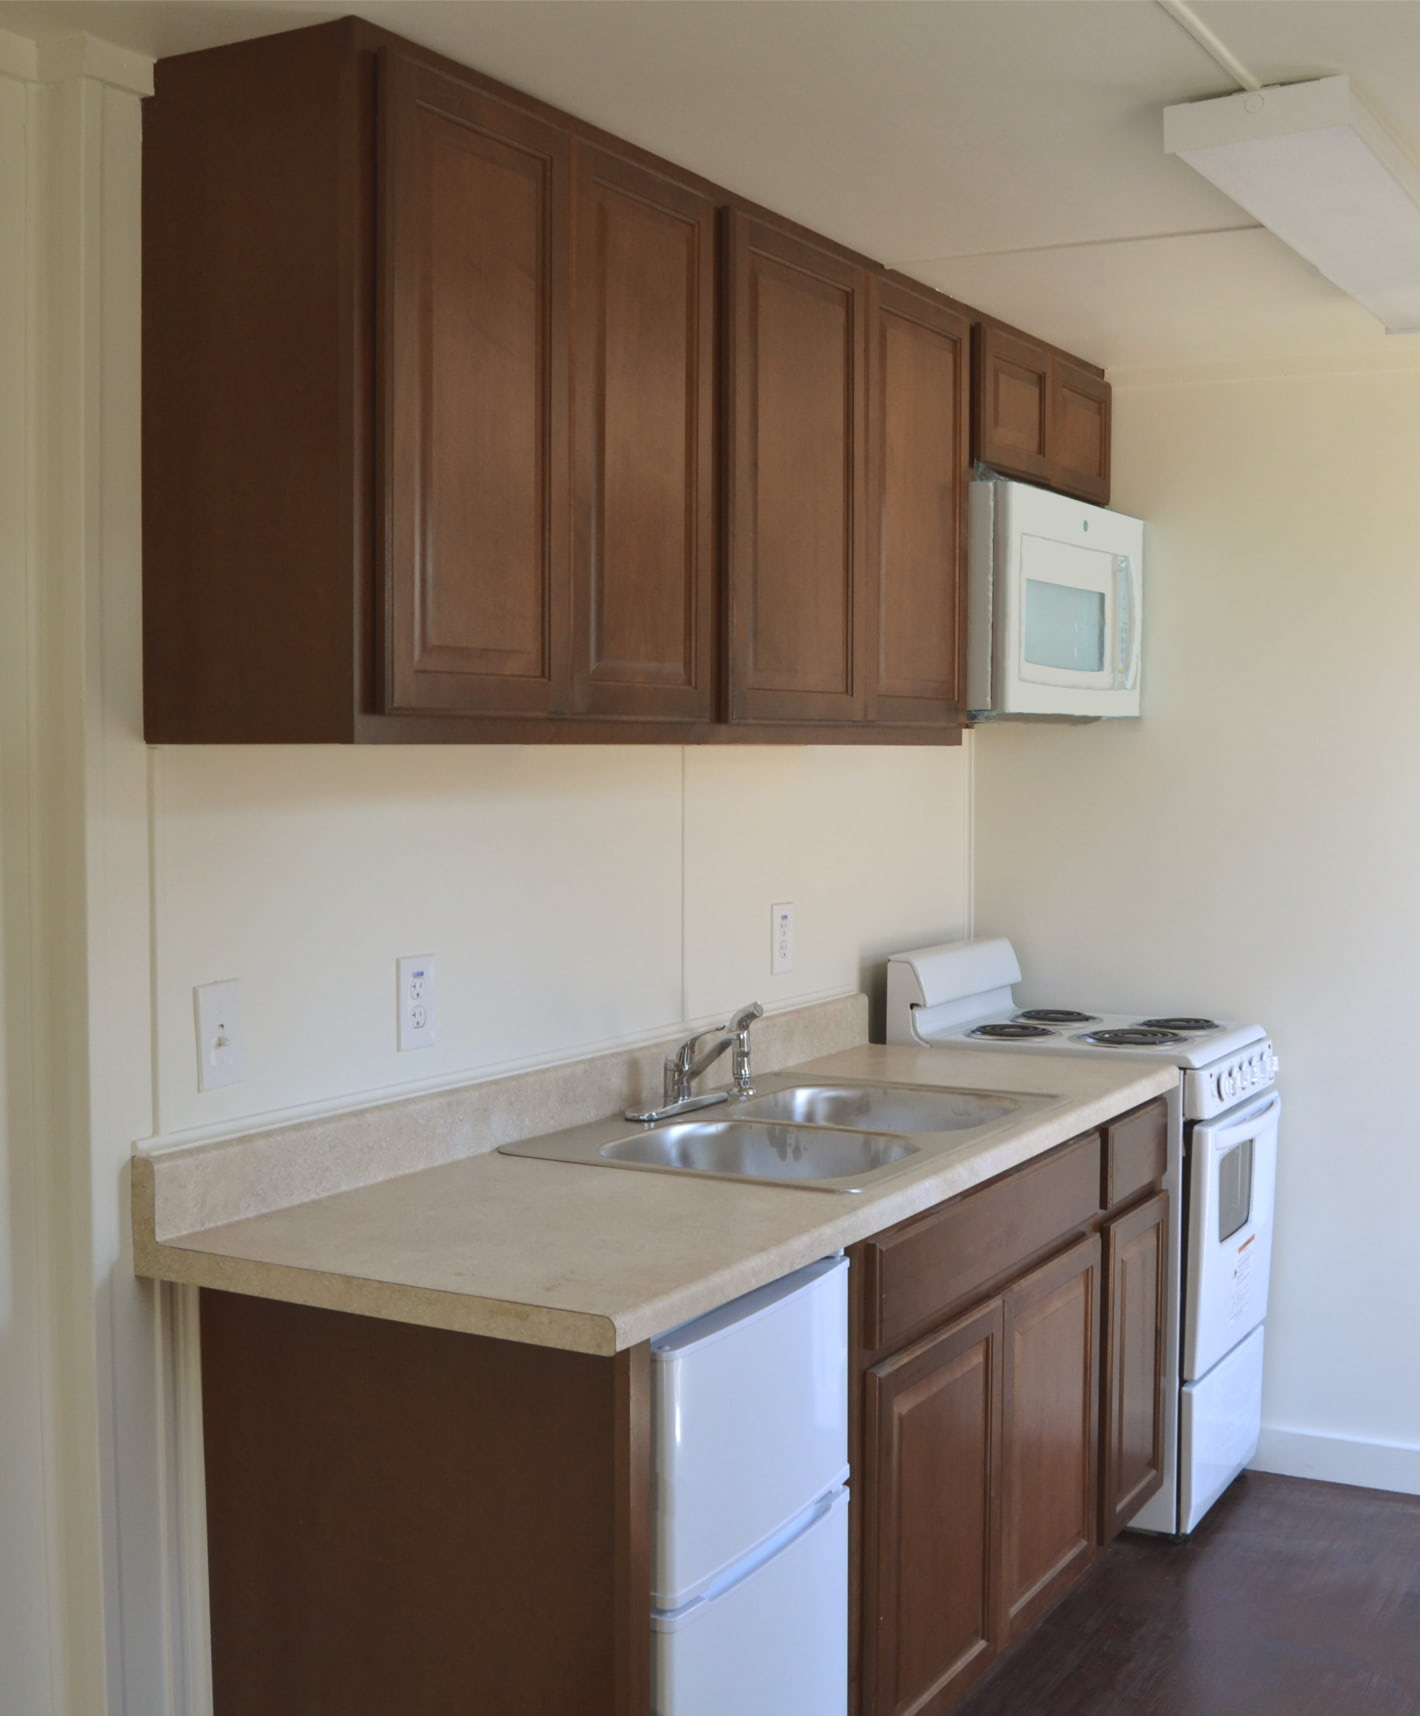 Interior of kitchenette in oil & gas housing unit.